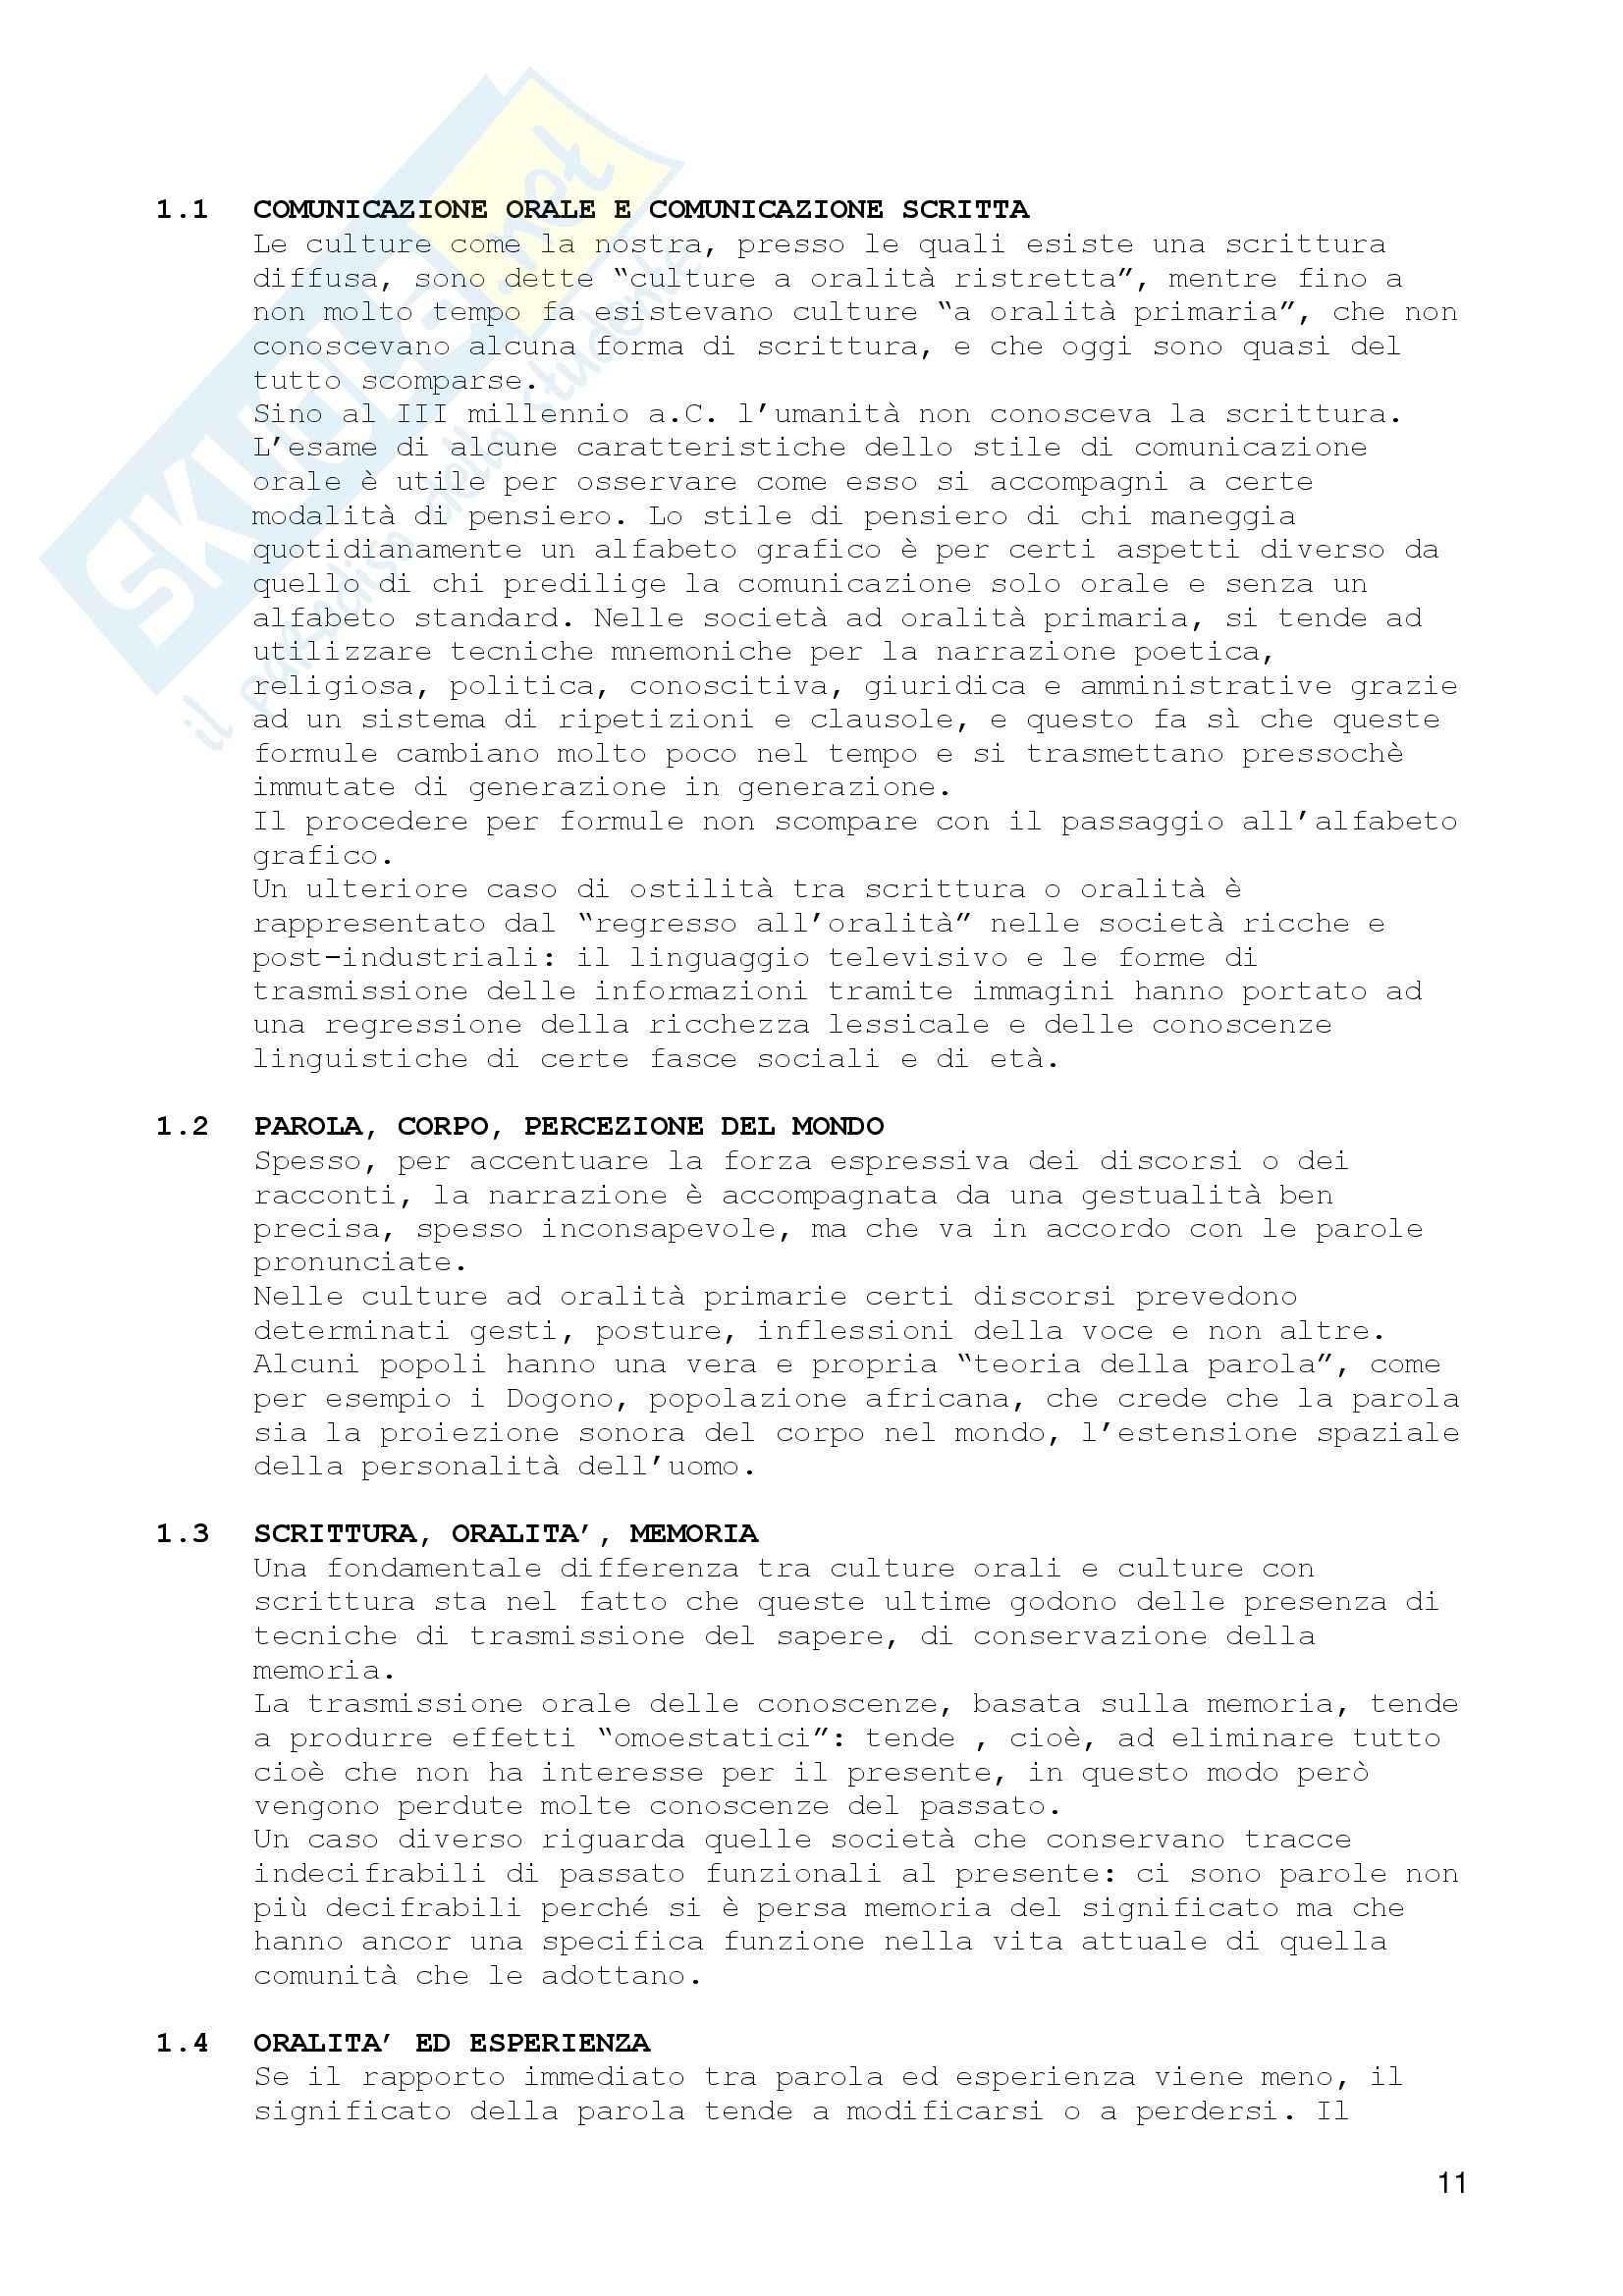 Antropologia culturale Pag. 11